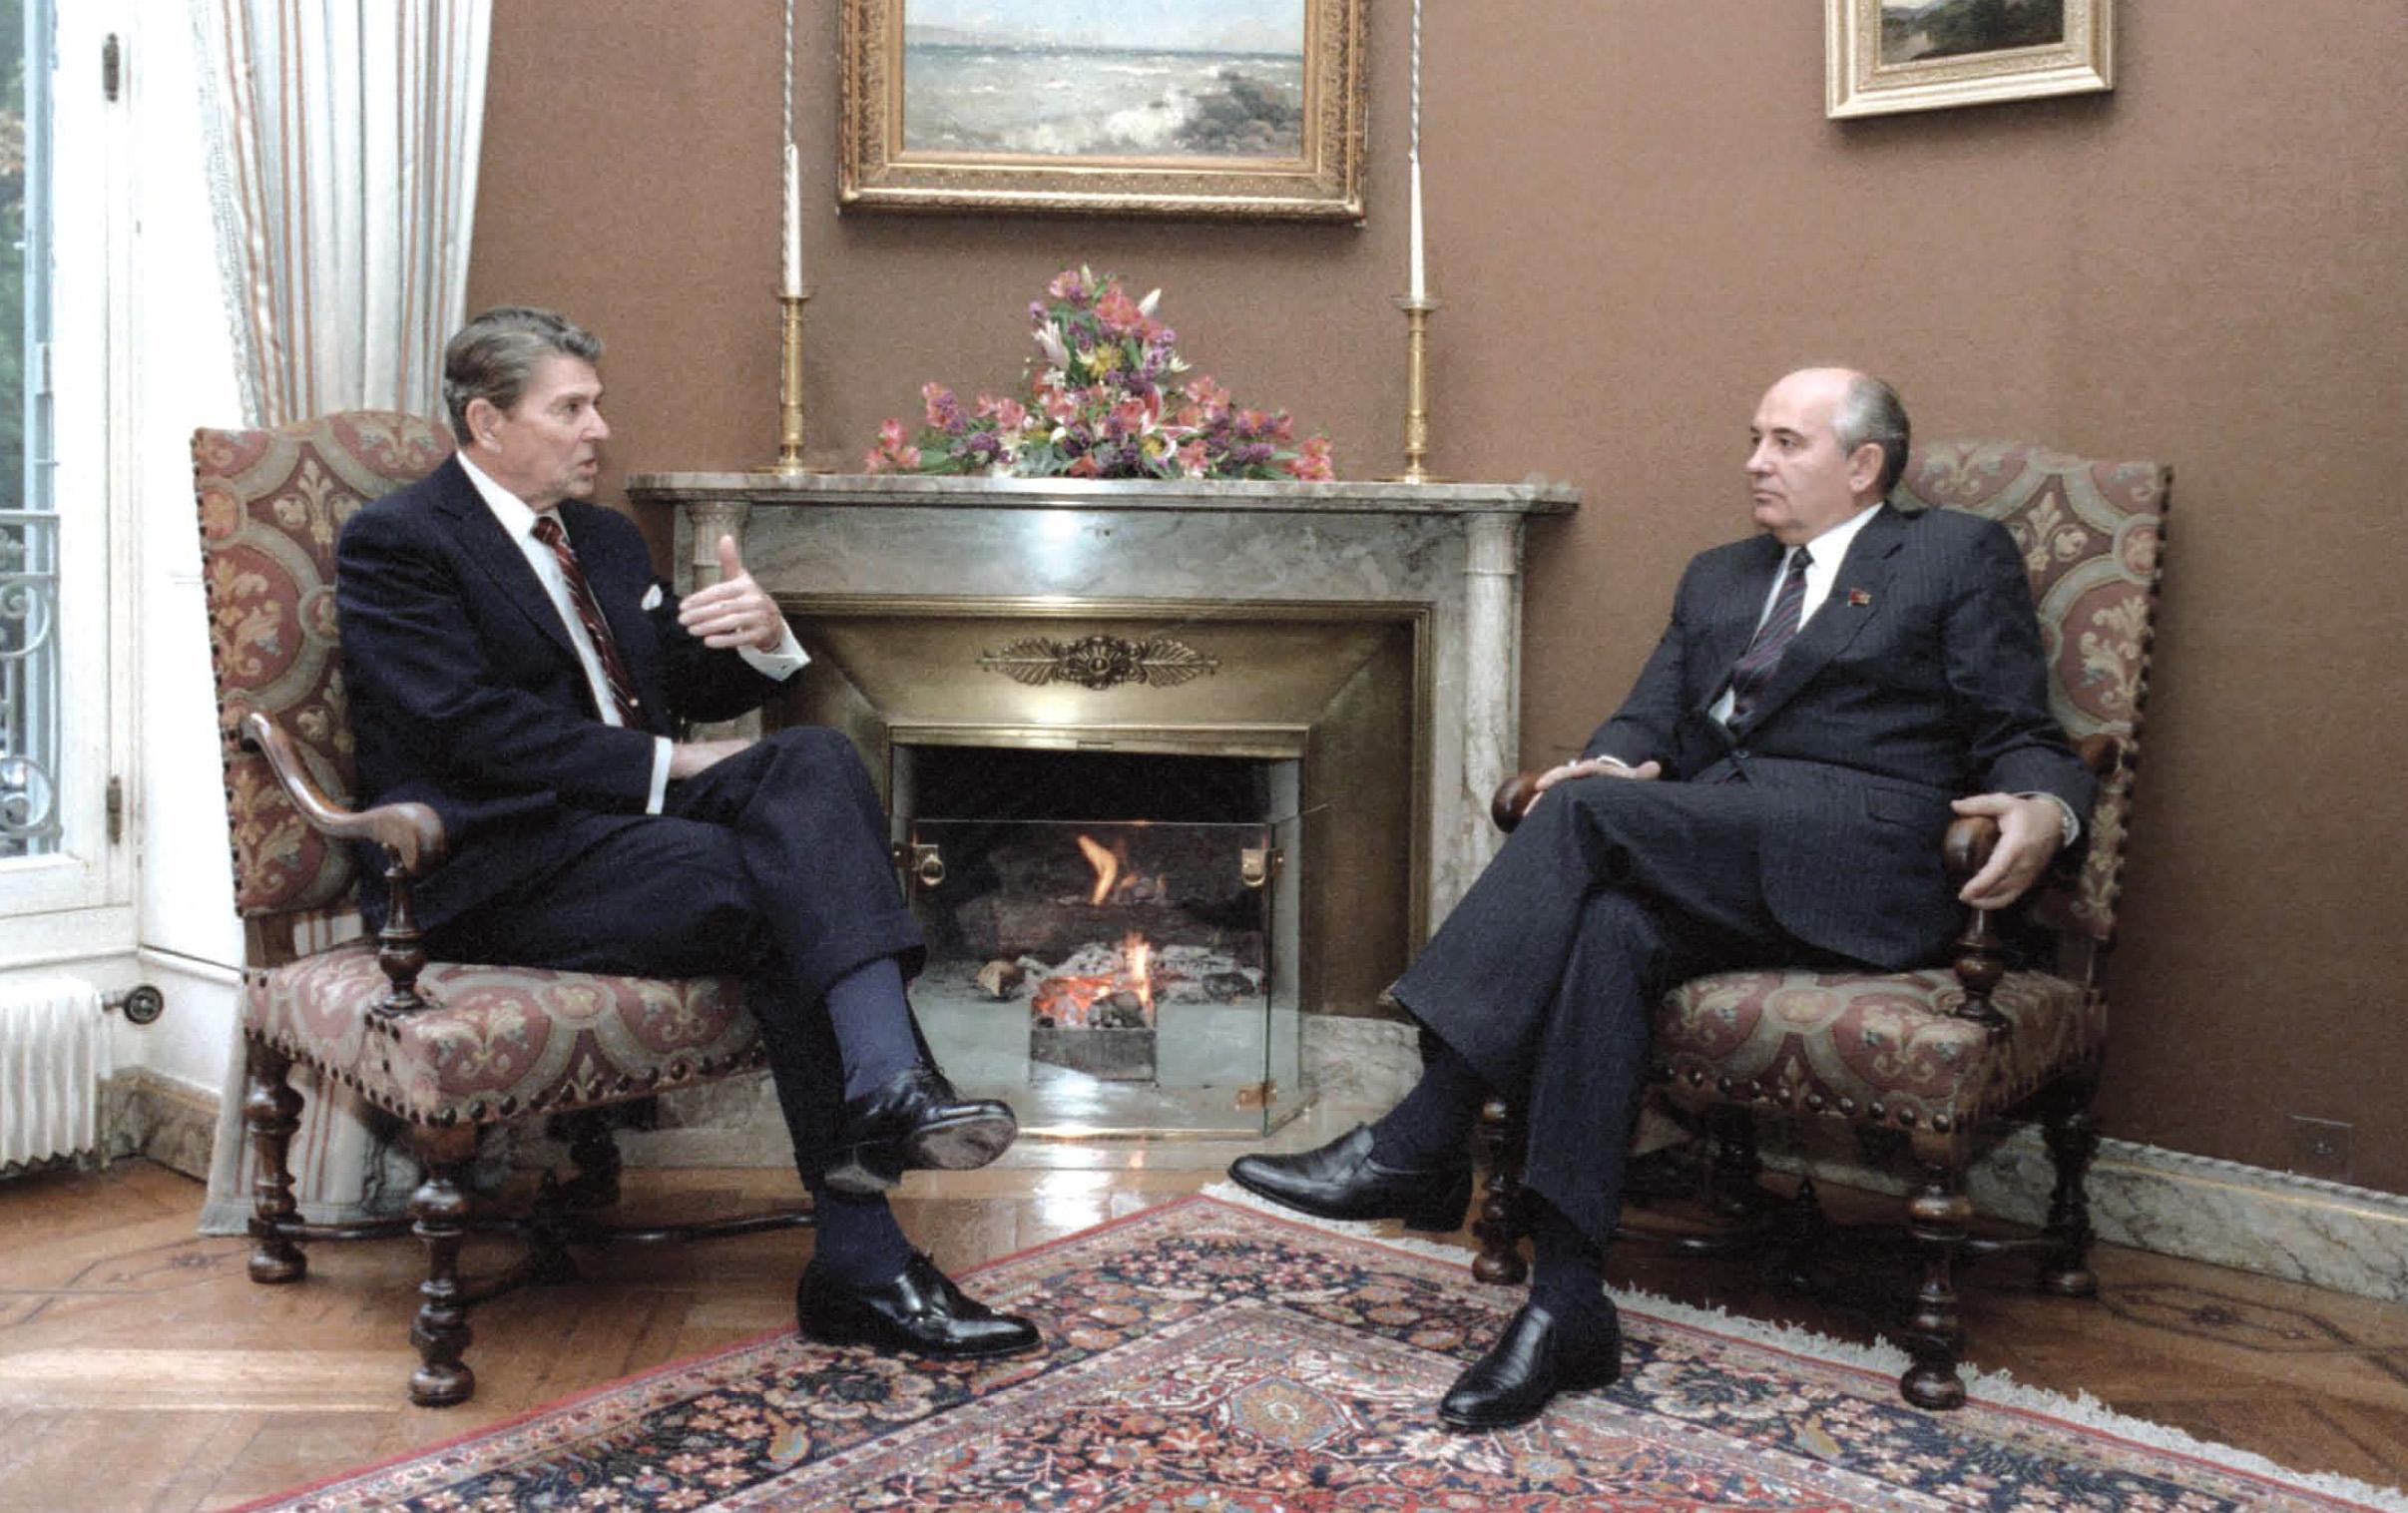 President Reagan's first meeting with Soviet General Secretary Gorbachev at Fleur D'Eau during the Geneva Summit in Switzerland on November 19, 1985.